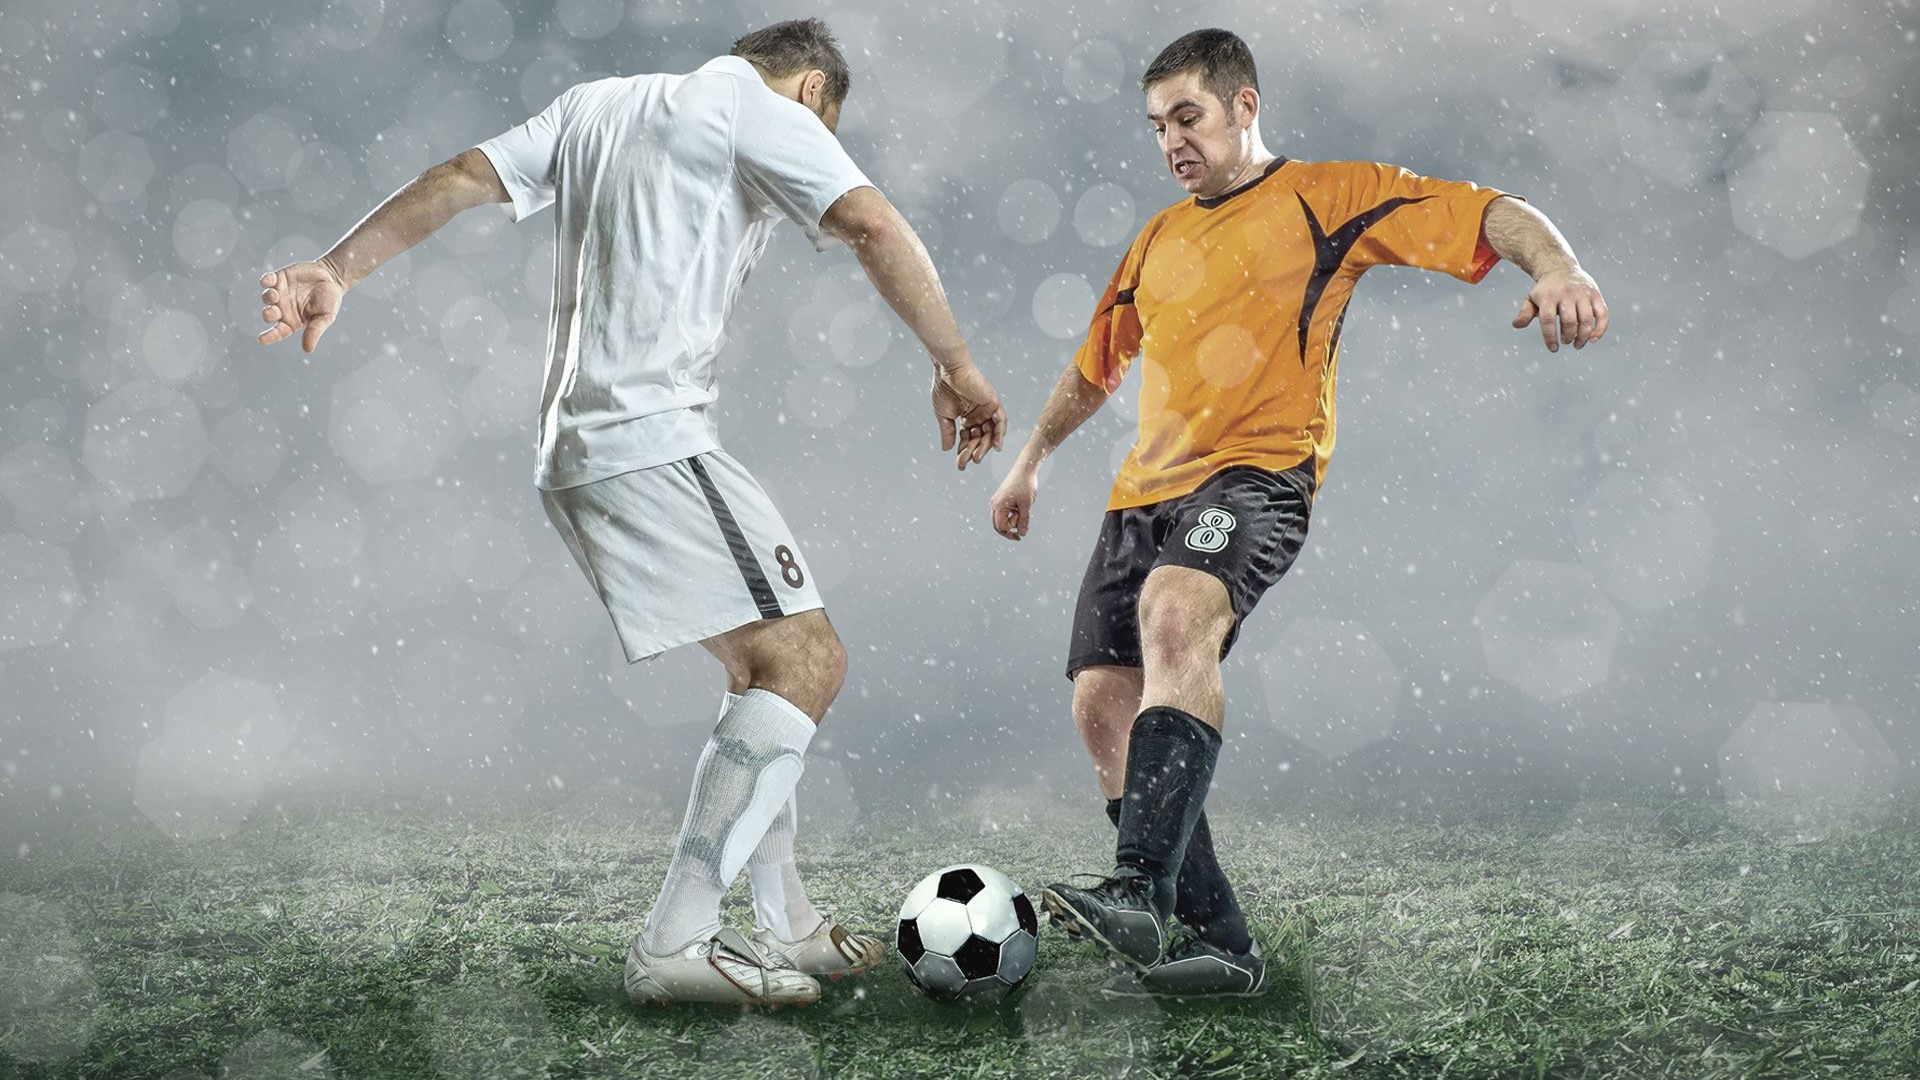 castleford-tigers-vs-warrington-wolves-rugby-live